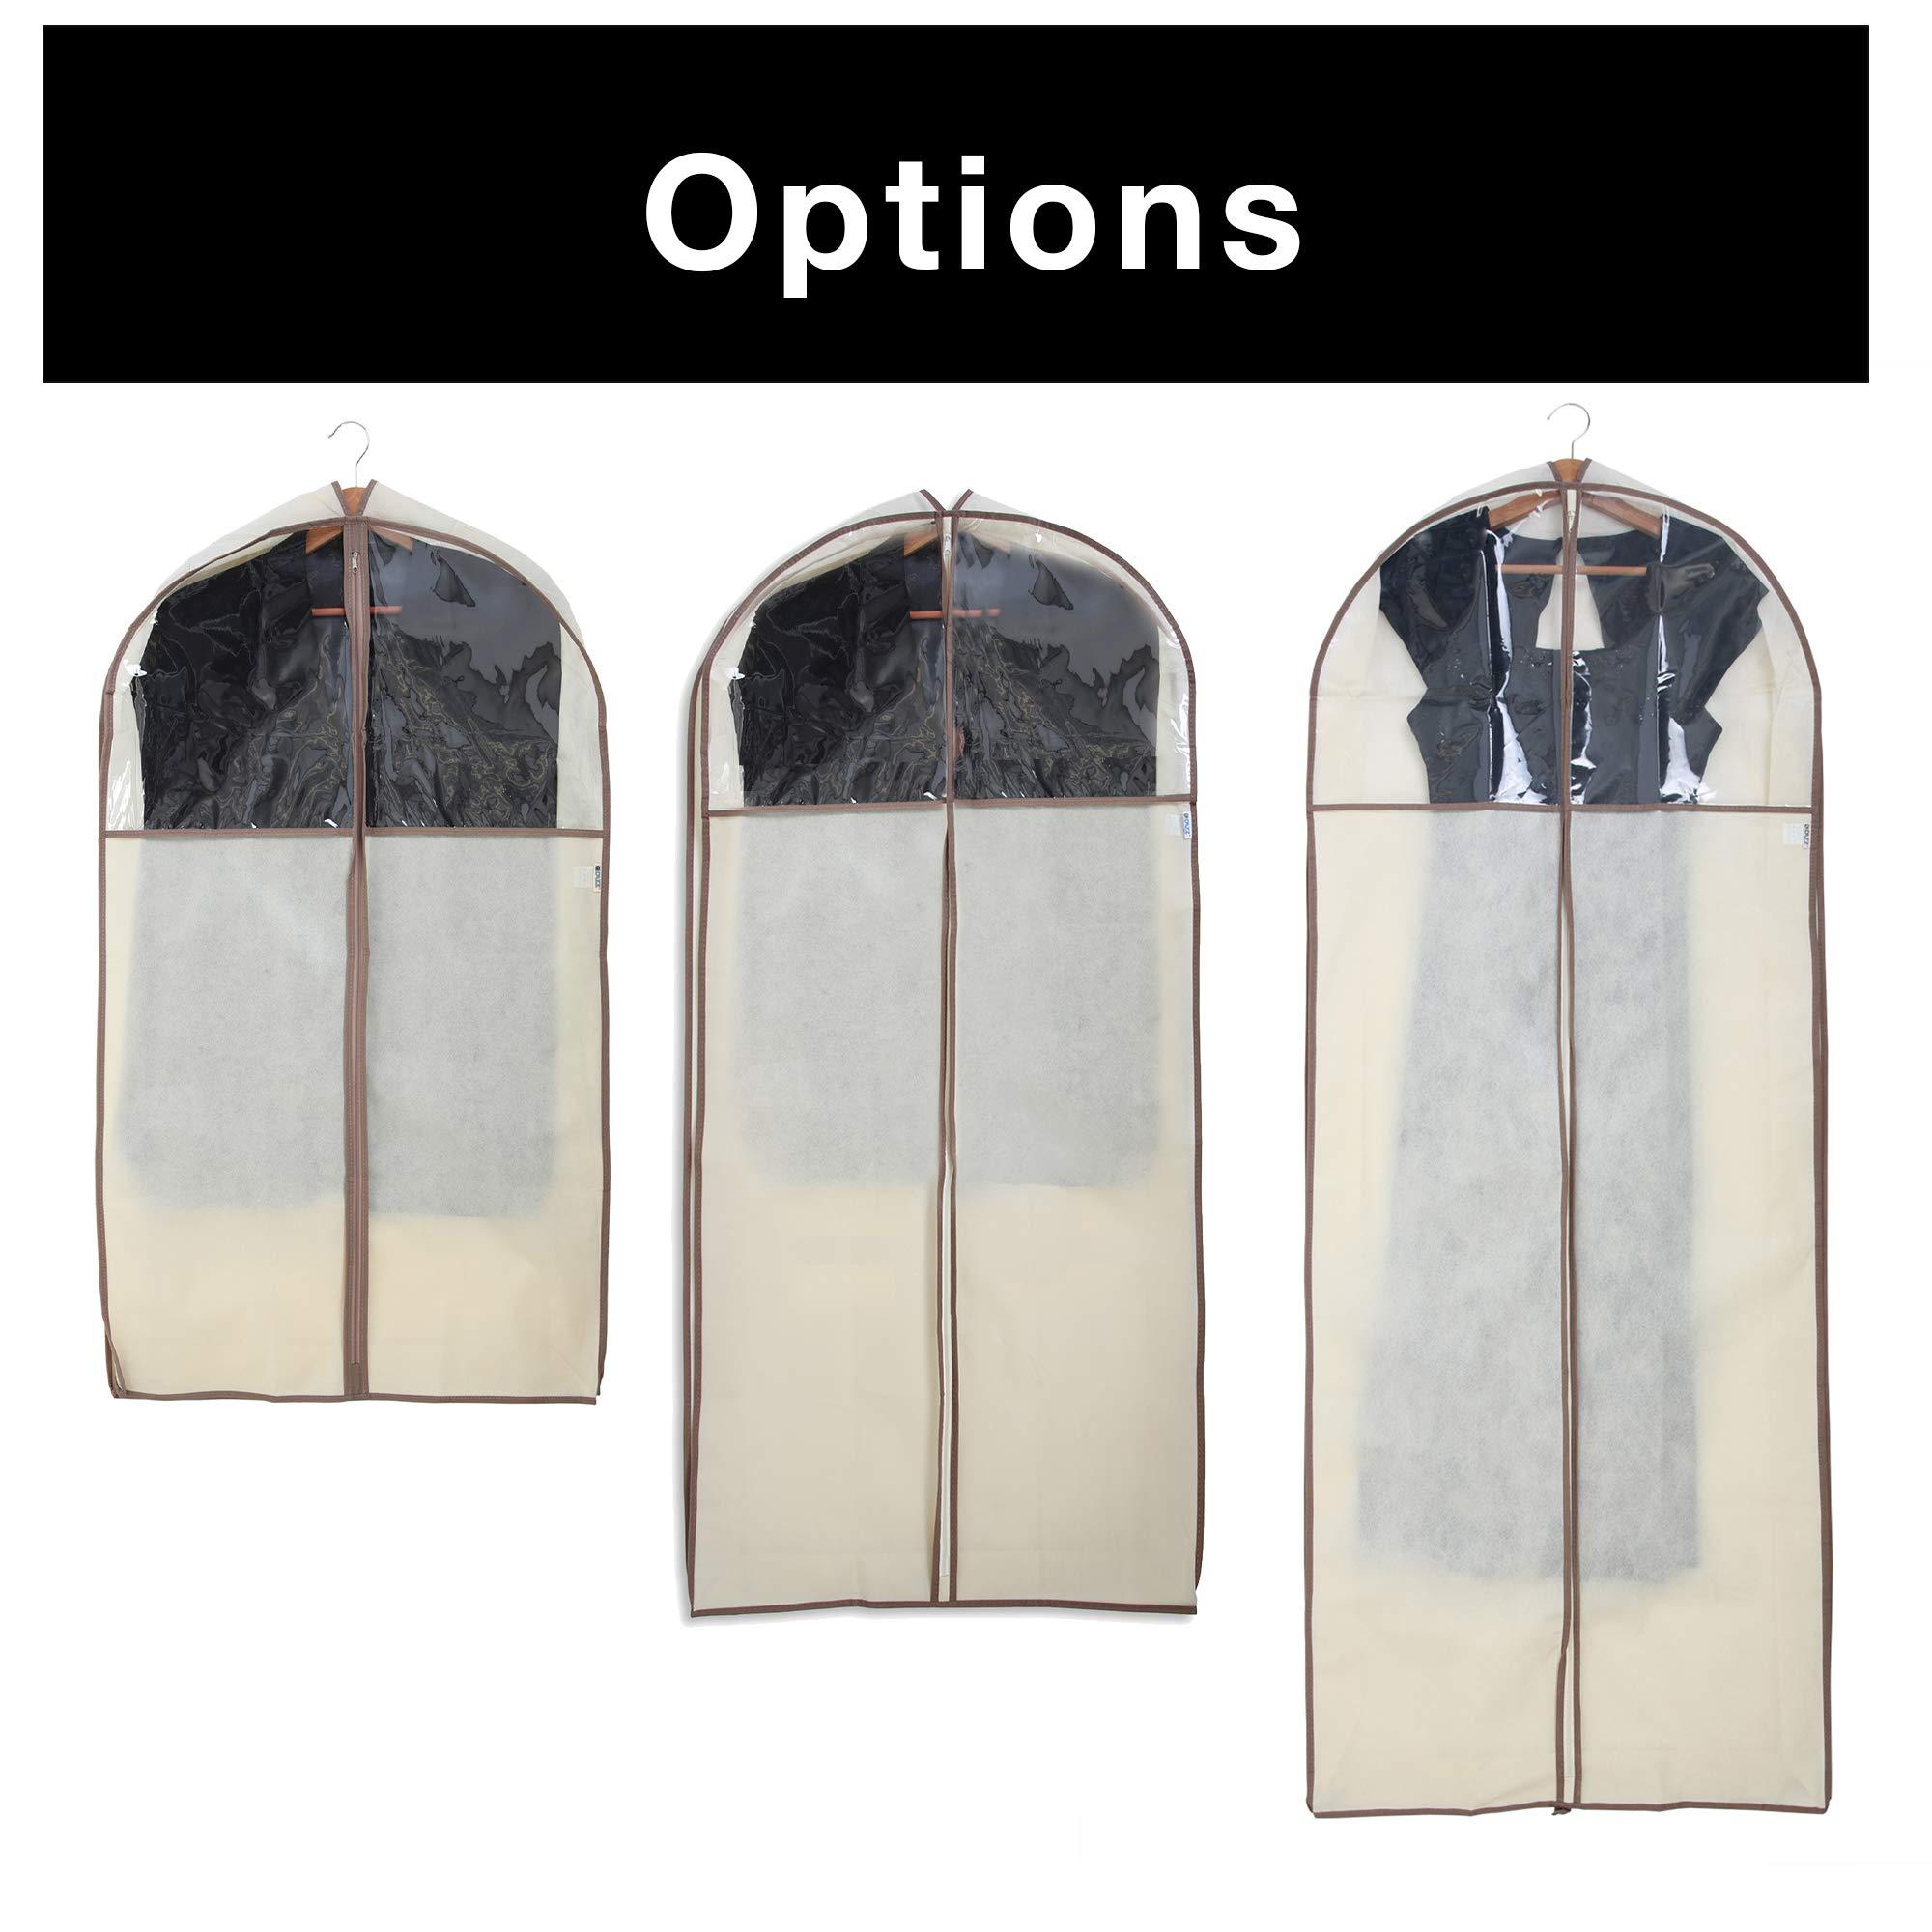 Smart Design Gusseted Garment Bag Hanger - Includes Zipper Closure /& Travel Loop Suits 24 x 42 Inch Beige - Clothing Storage Cover Dresses Travel Closet Organization -